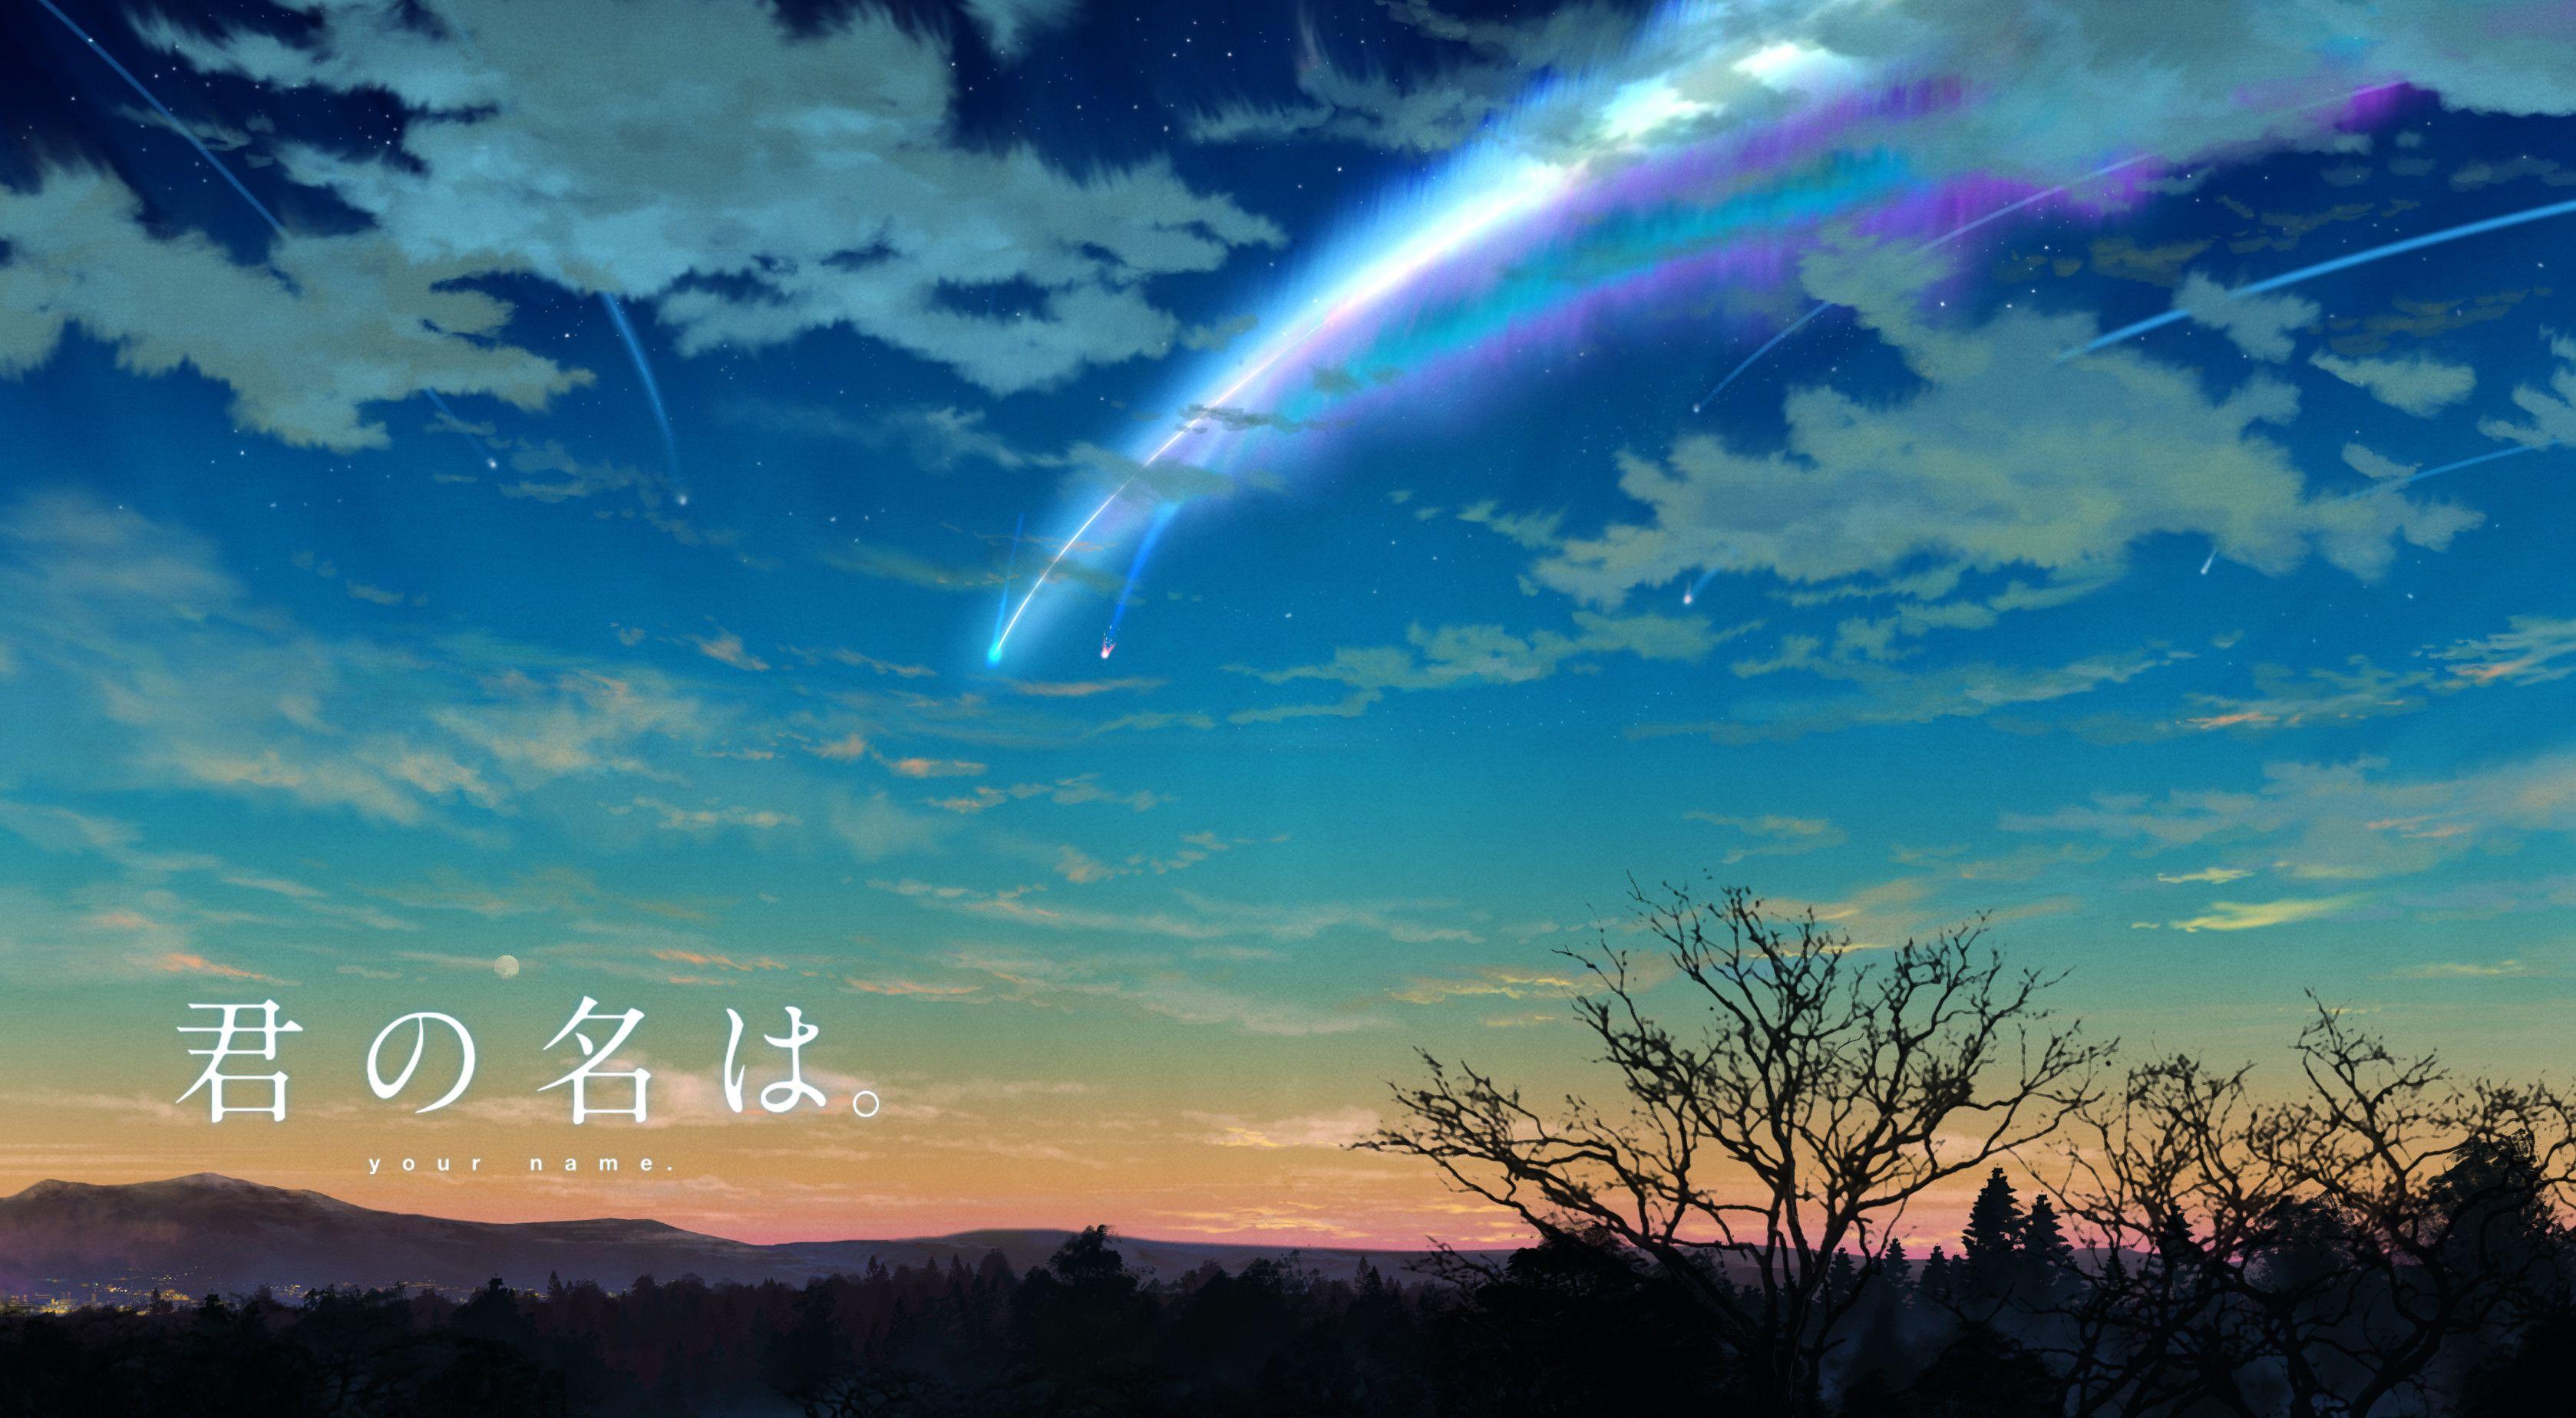 3356x1848 Anime Your Name Kimi No Na Wa Wallpaper Web In 2019